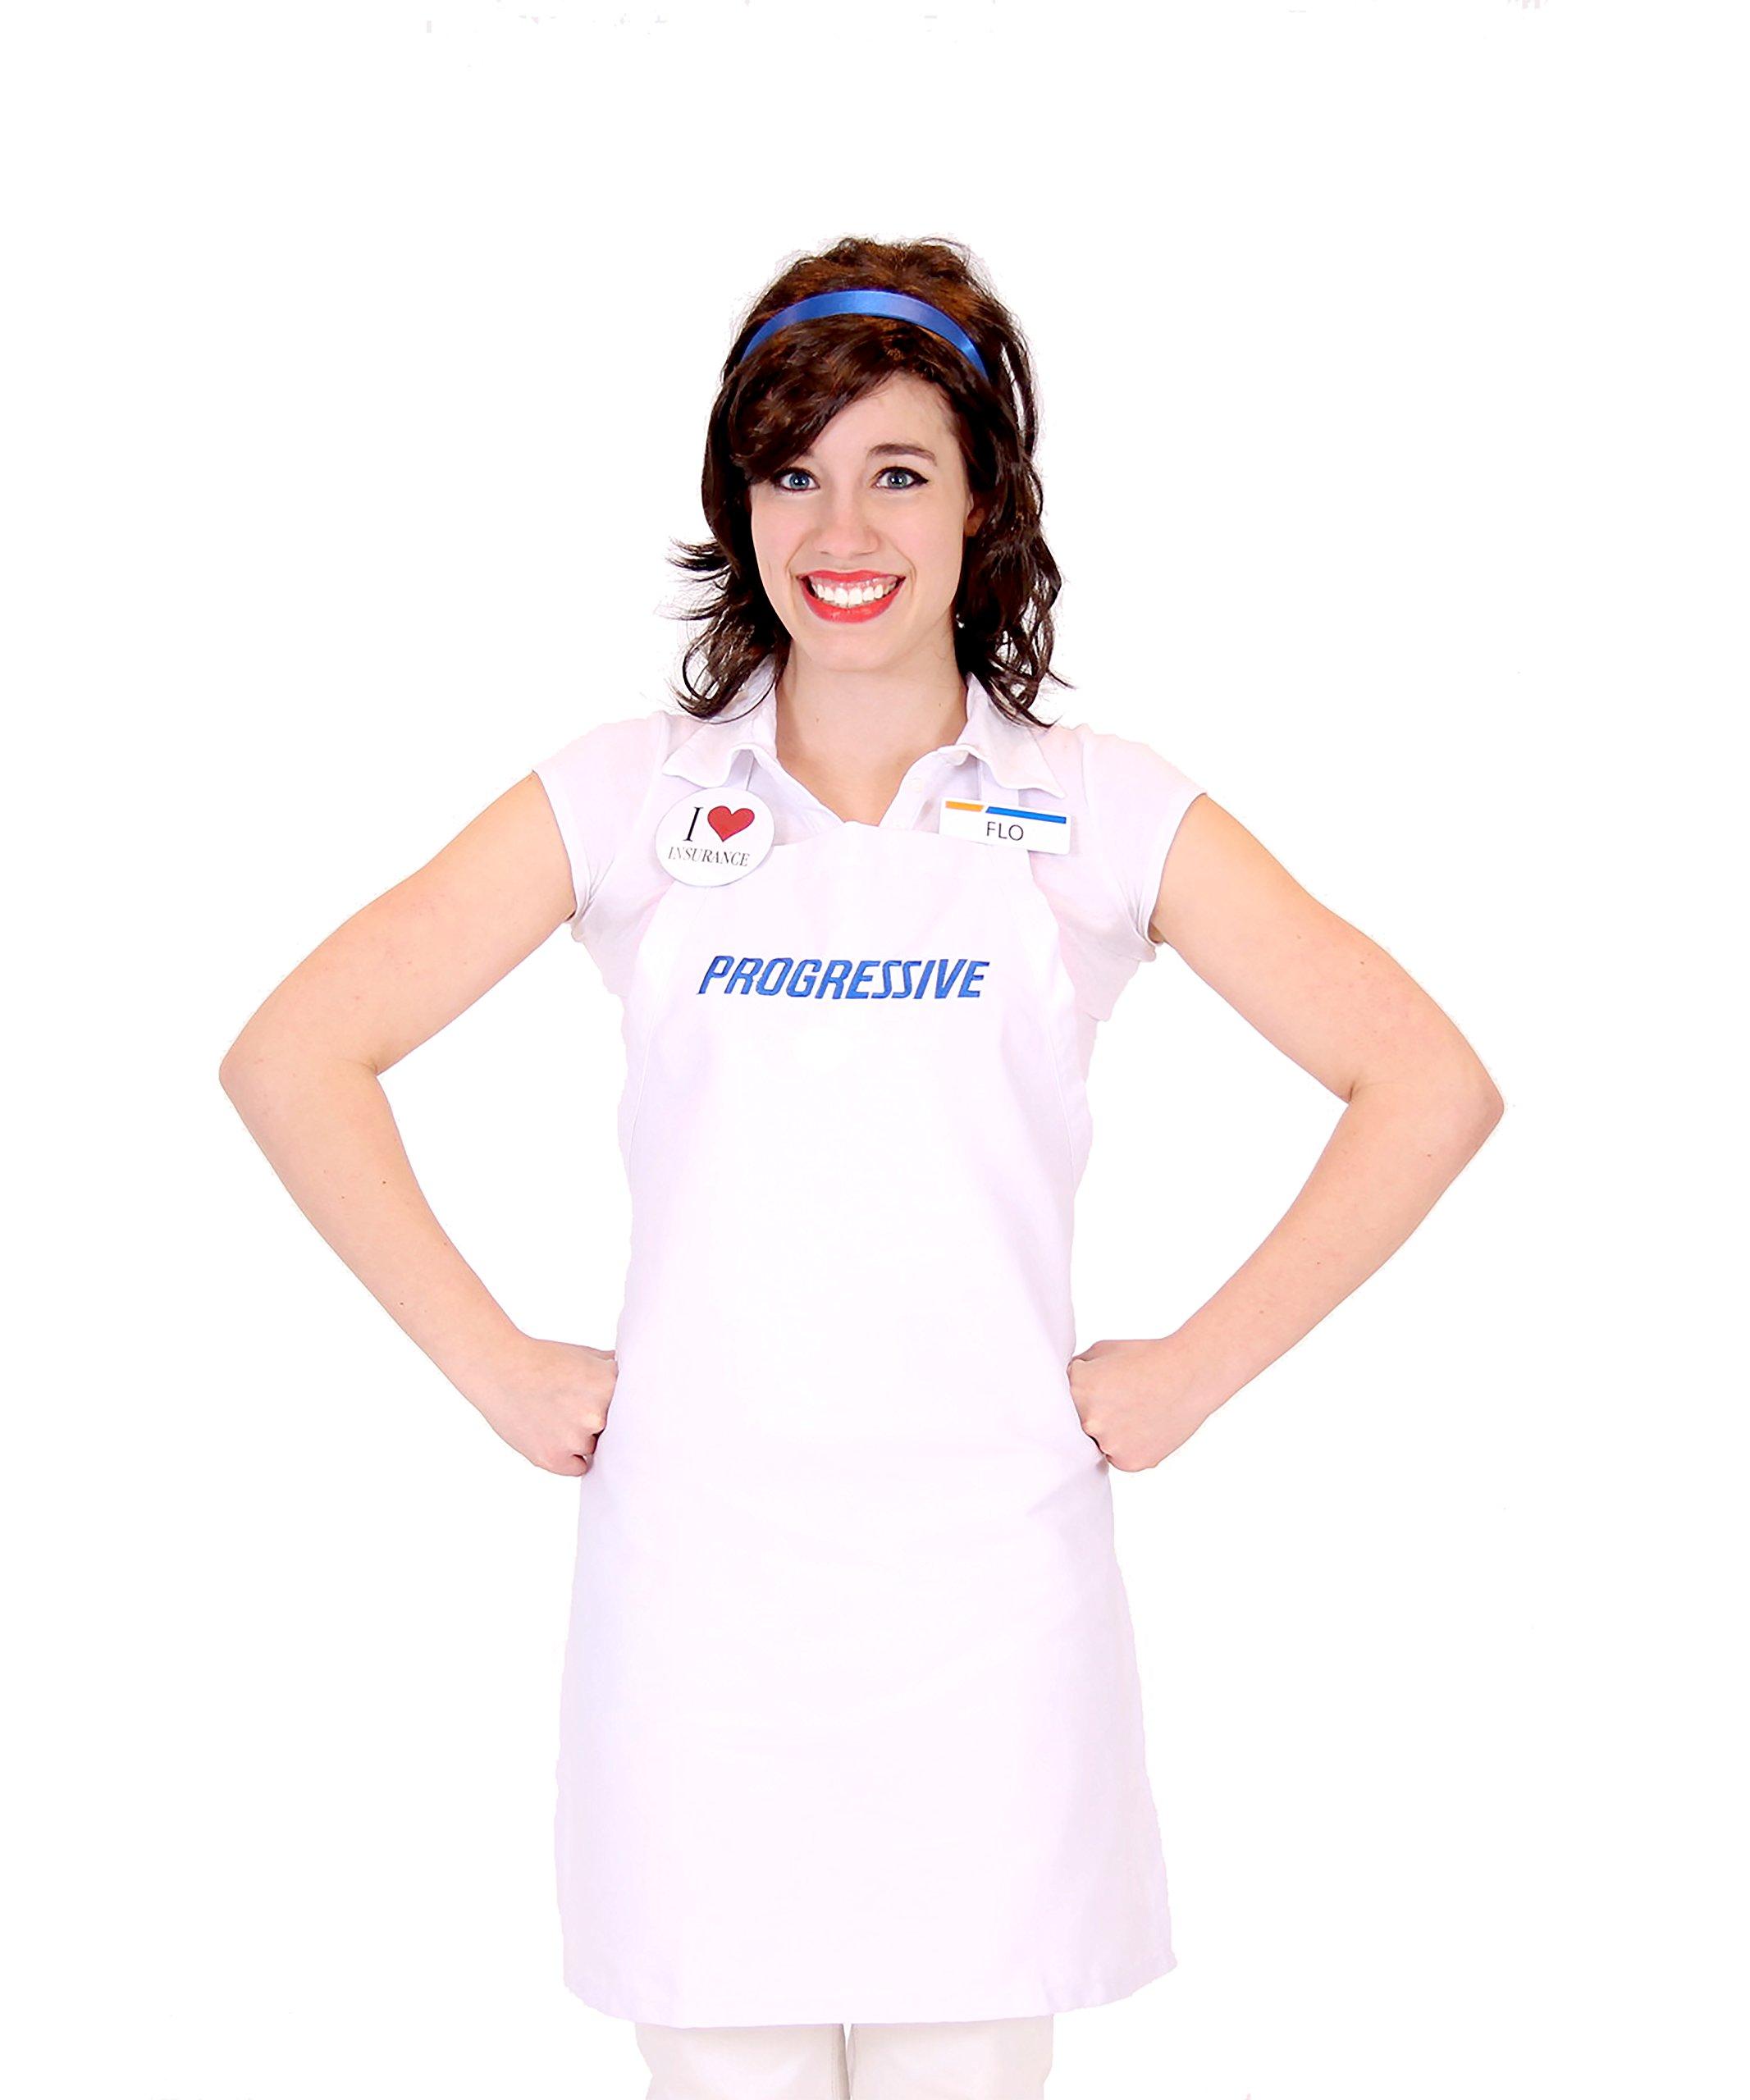 Progressive Flo Costume Set - ST by Costume Agent (Image #1)